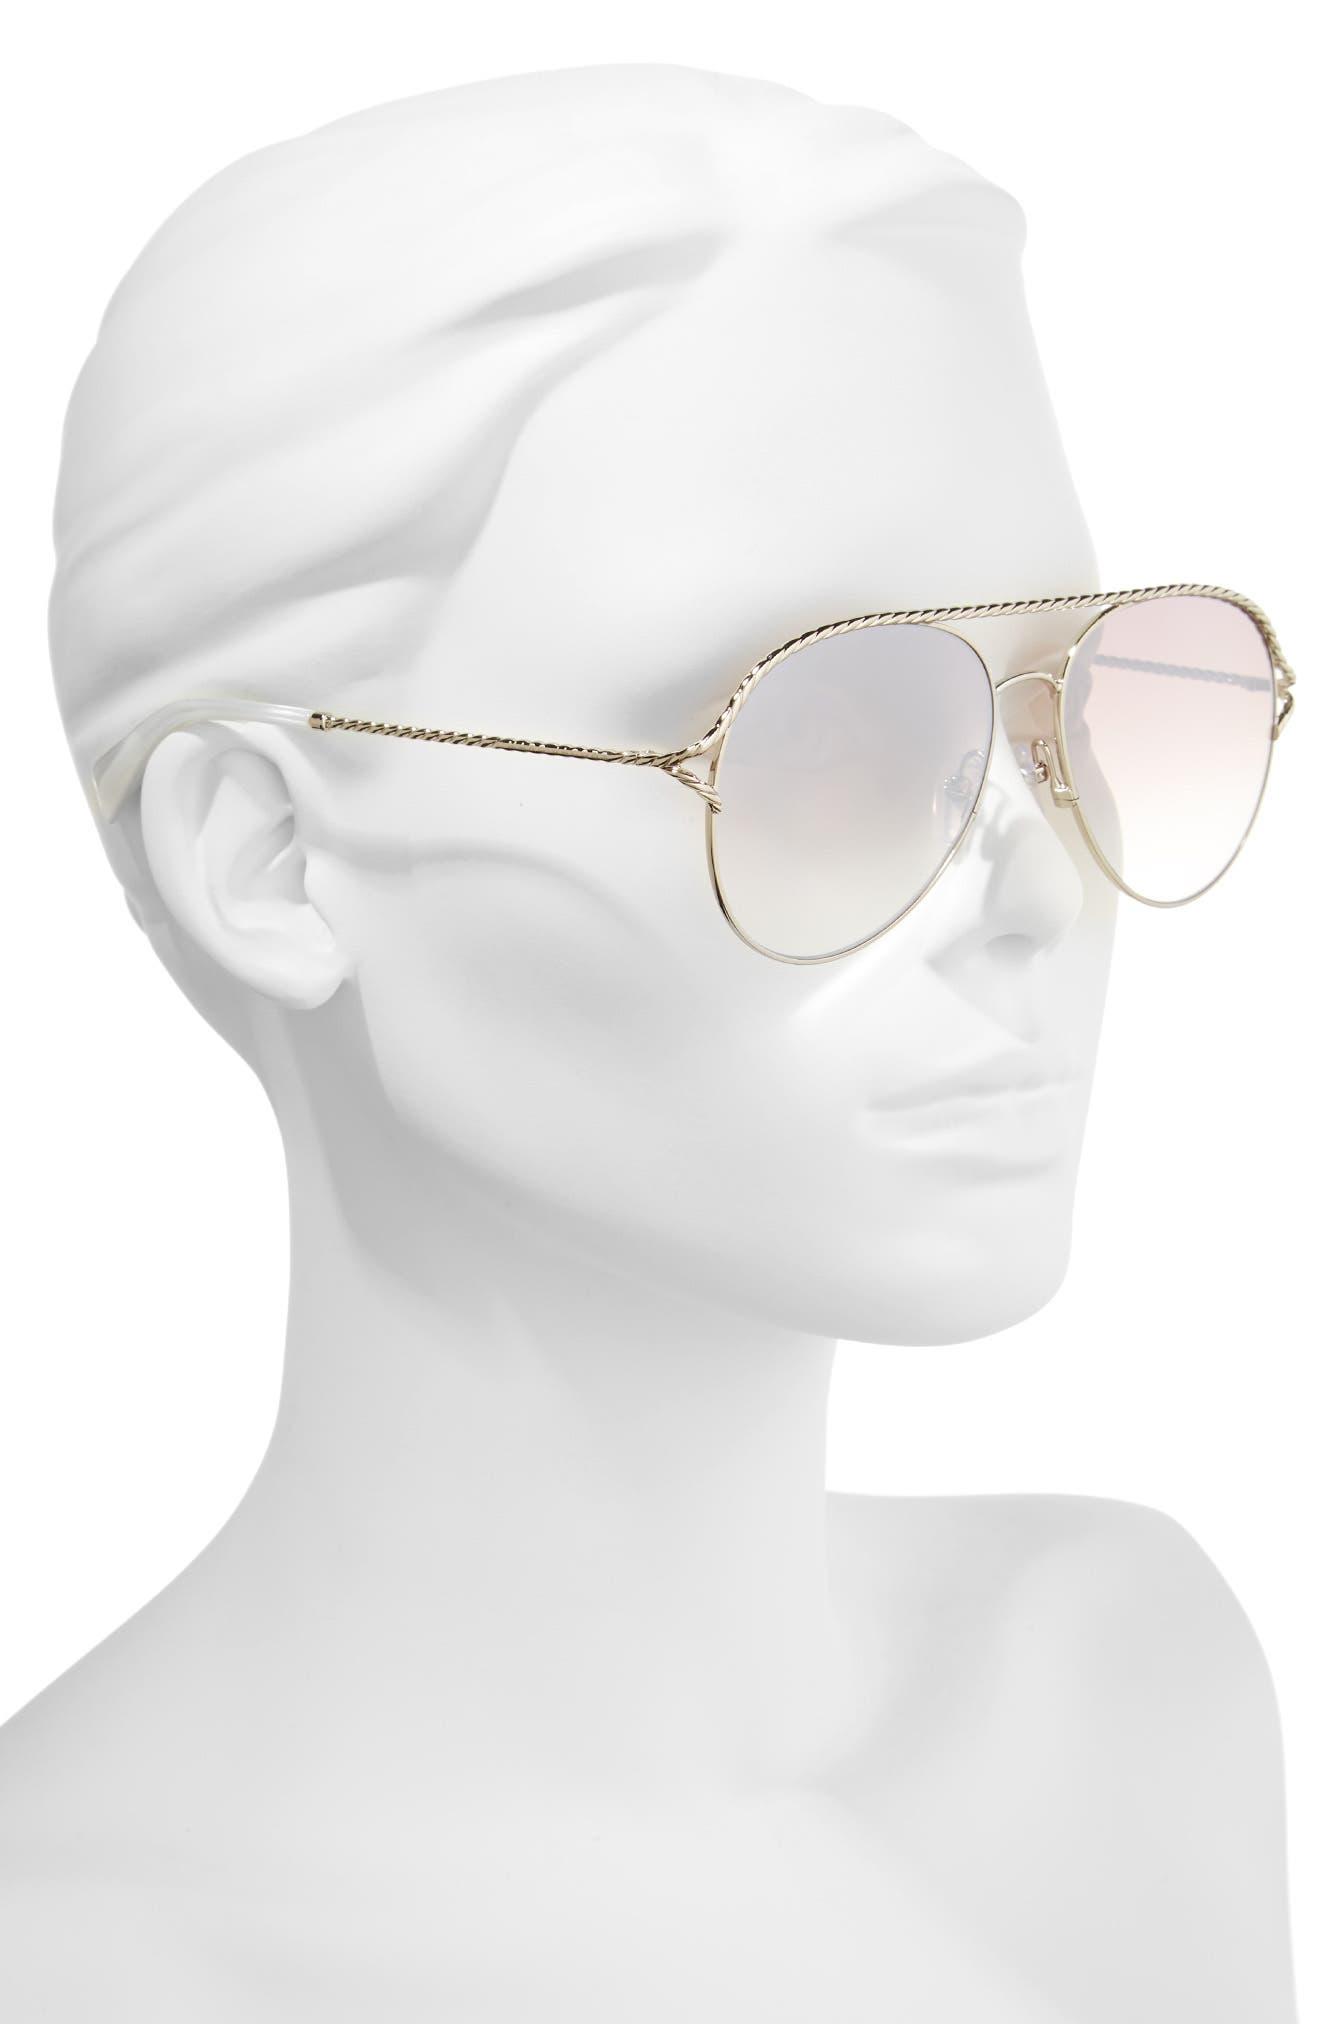 58mm Aviator Sunglasses,                             Alternate thumbnail 2, color,                             100